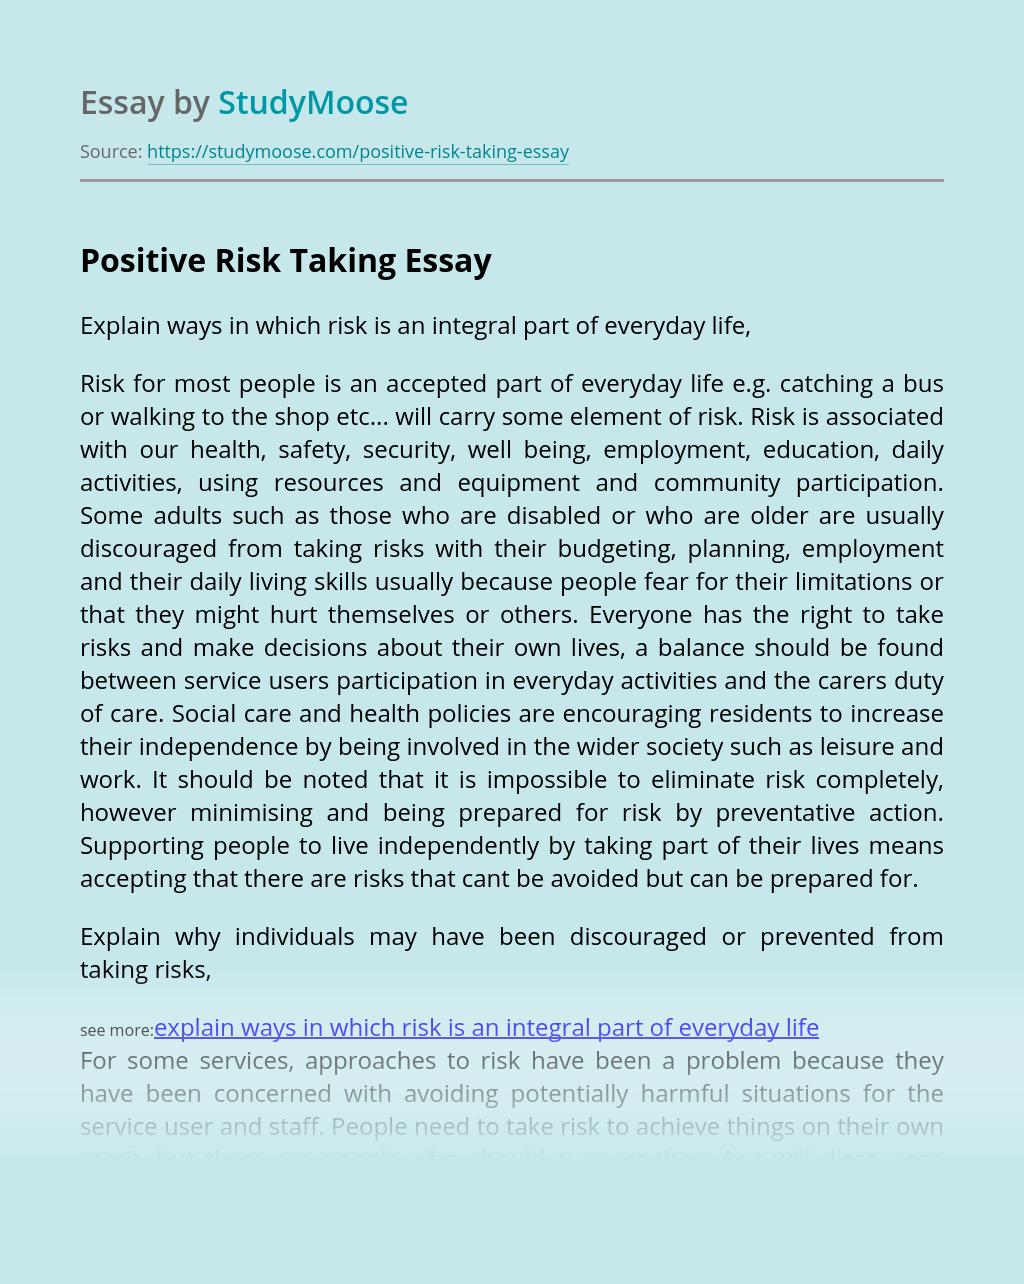 Positive Risk Taking